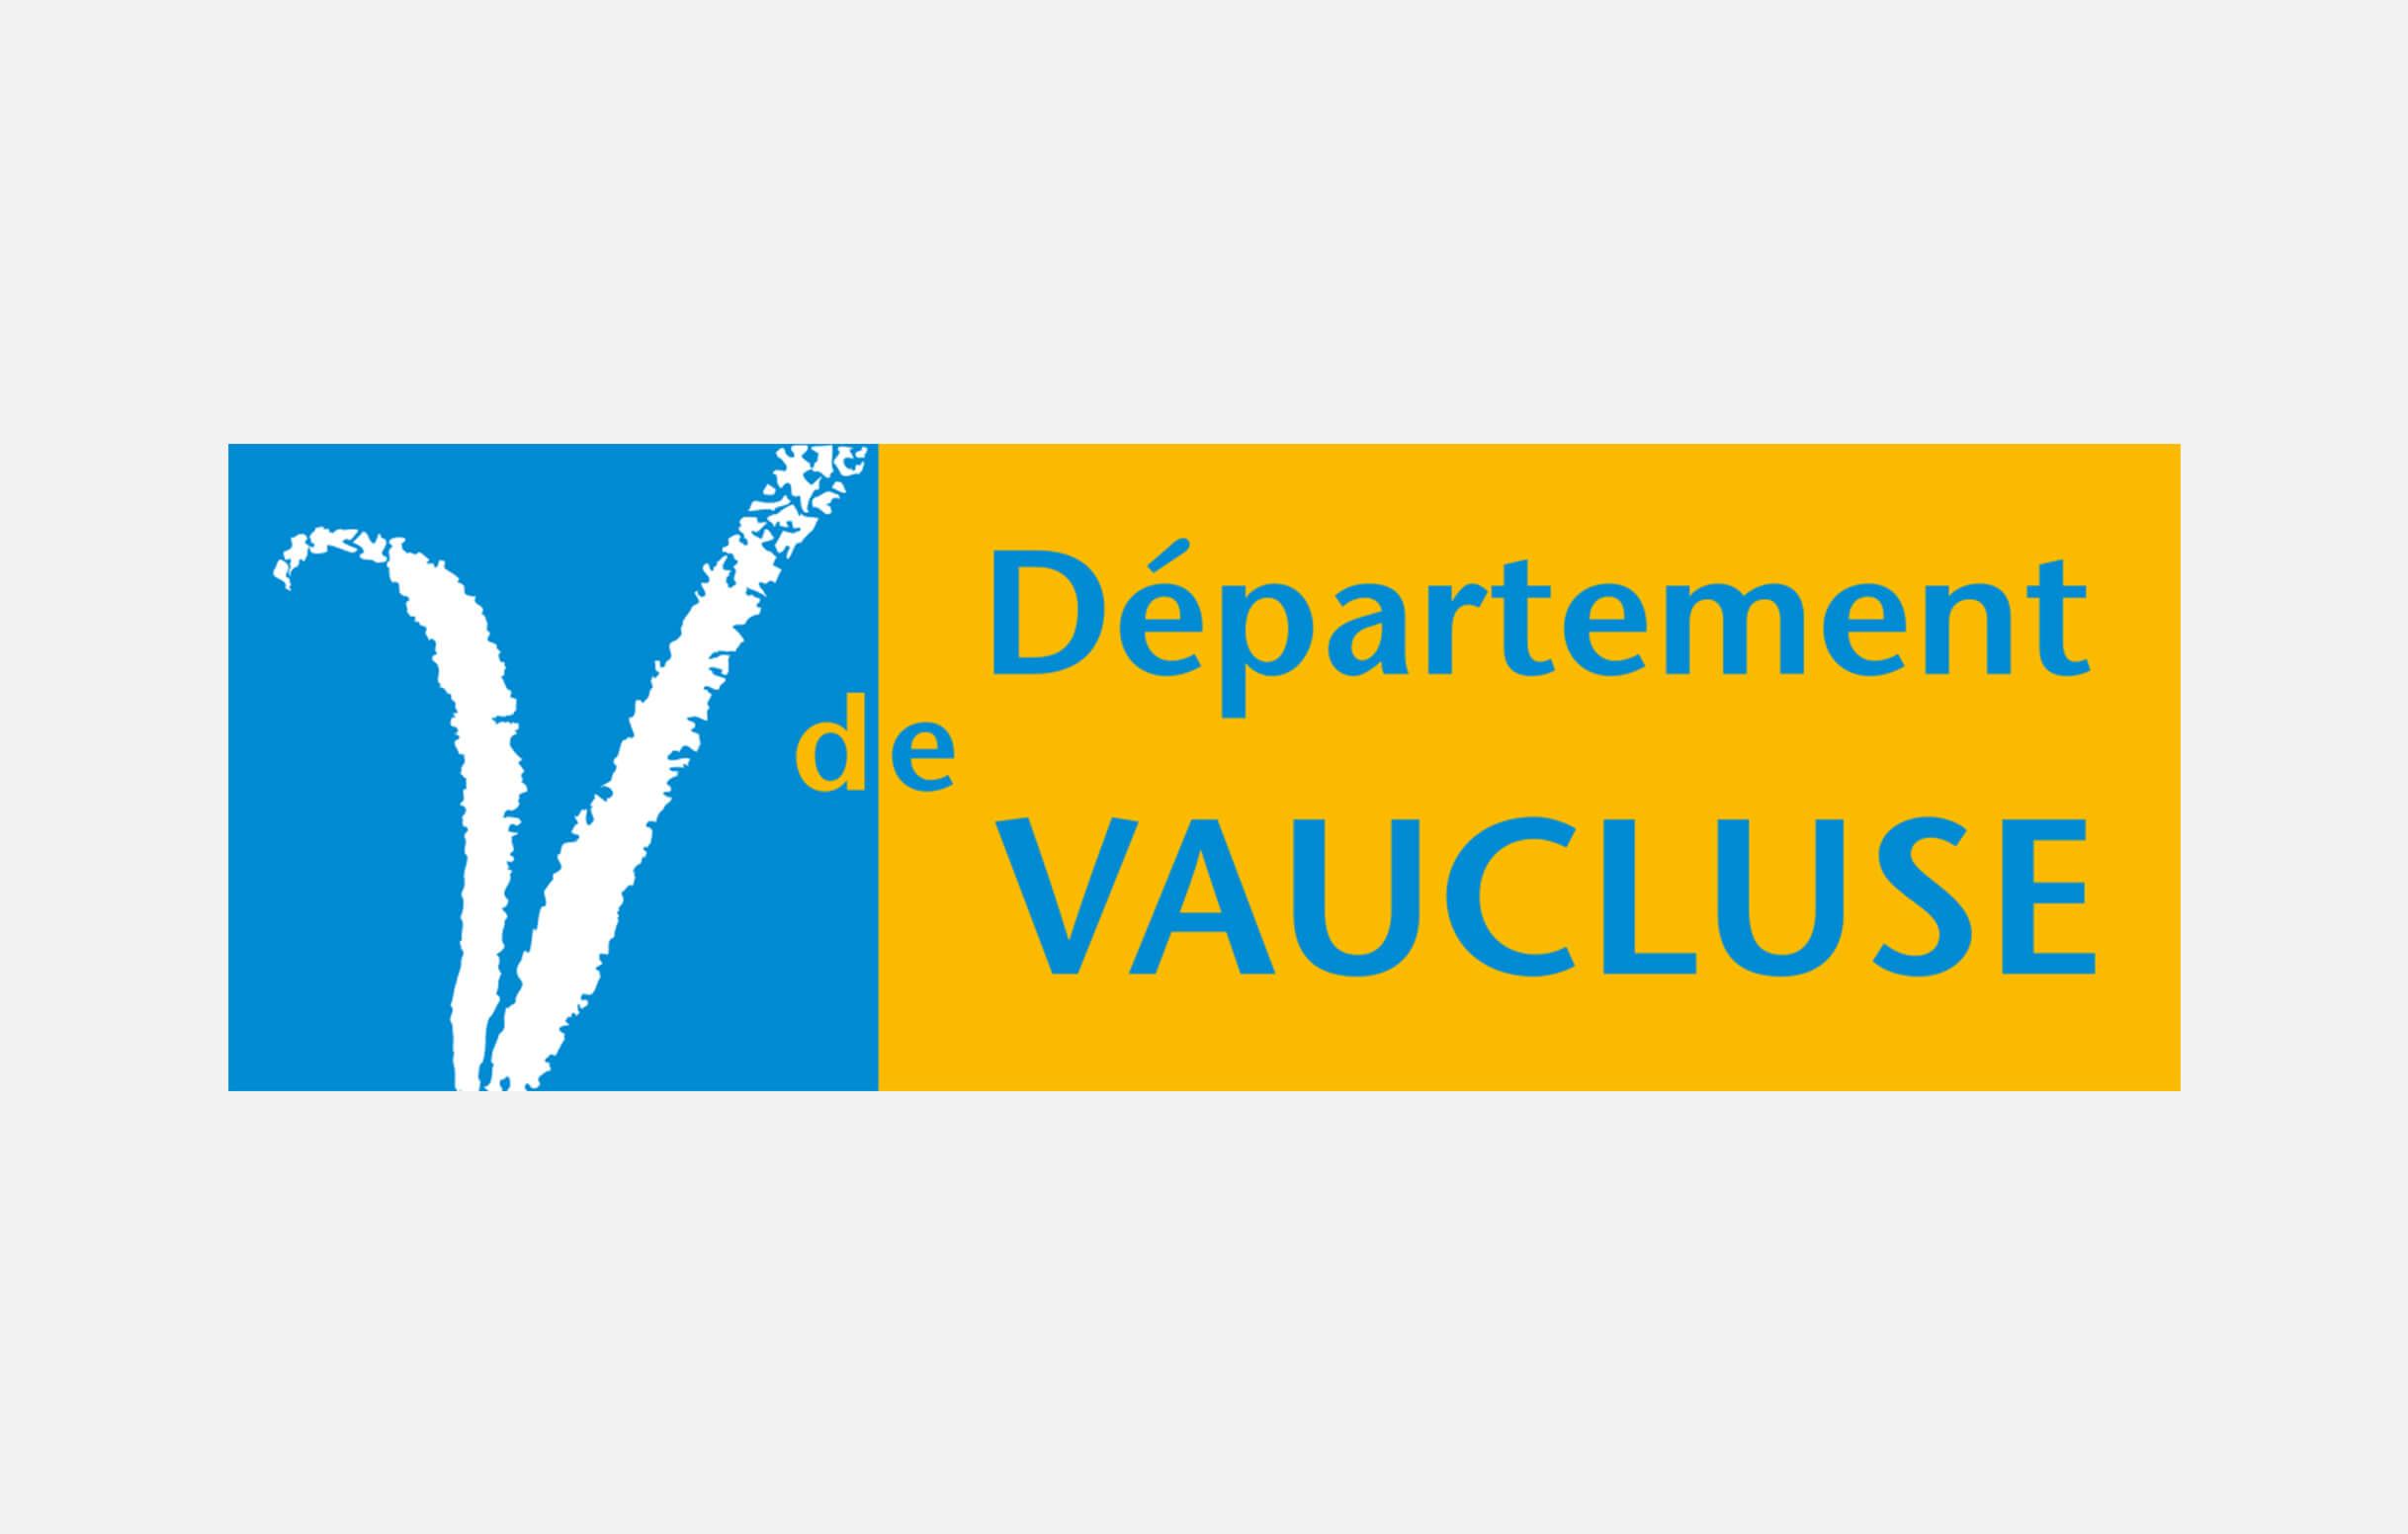 Departement vaucluse